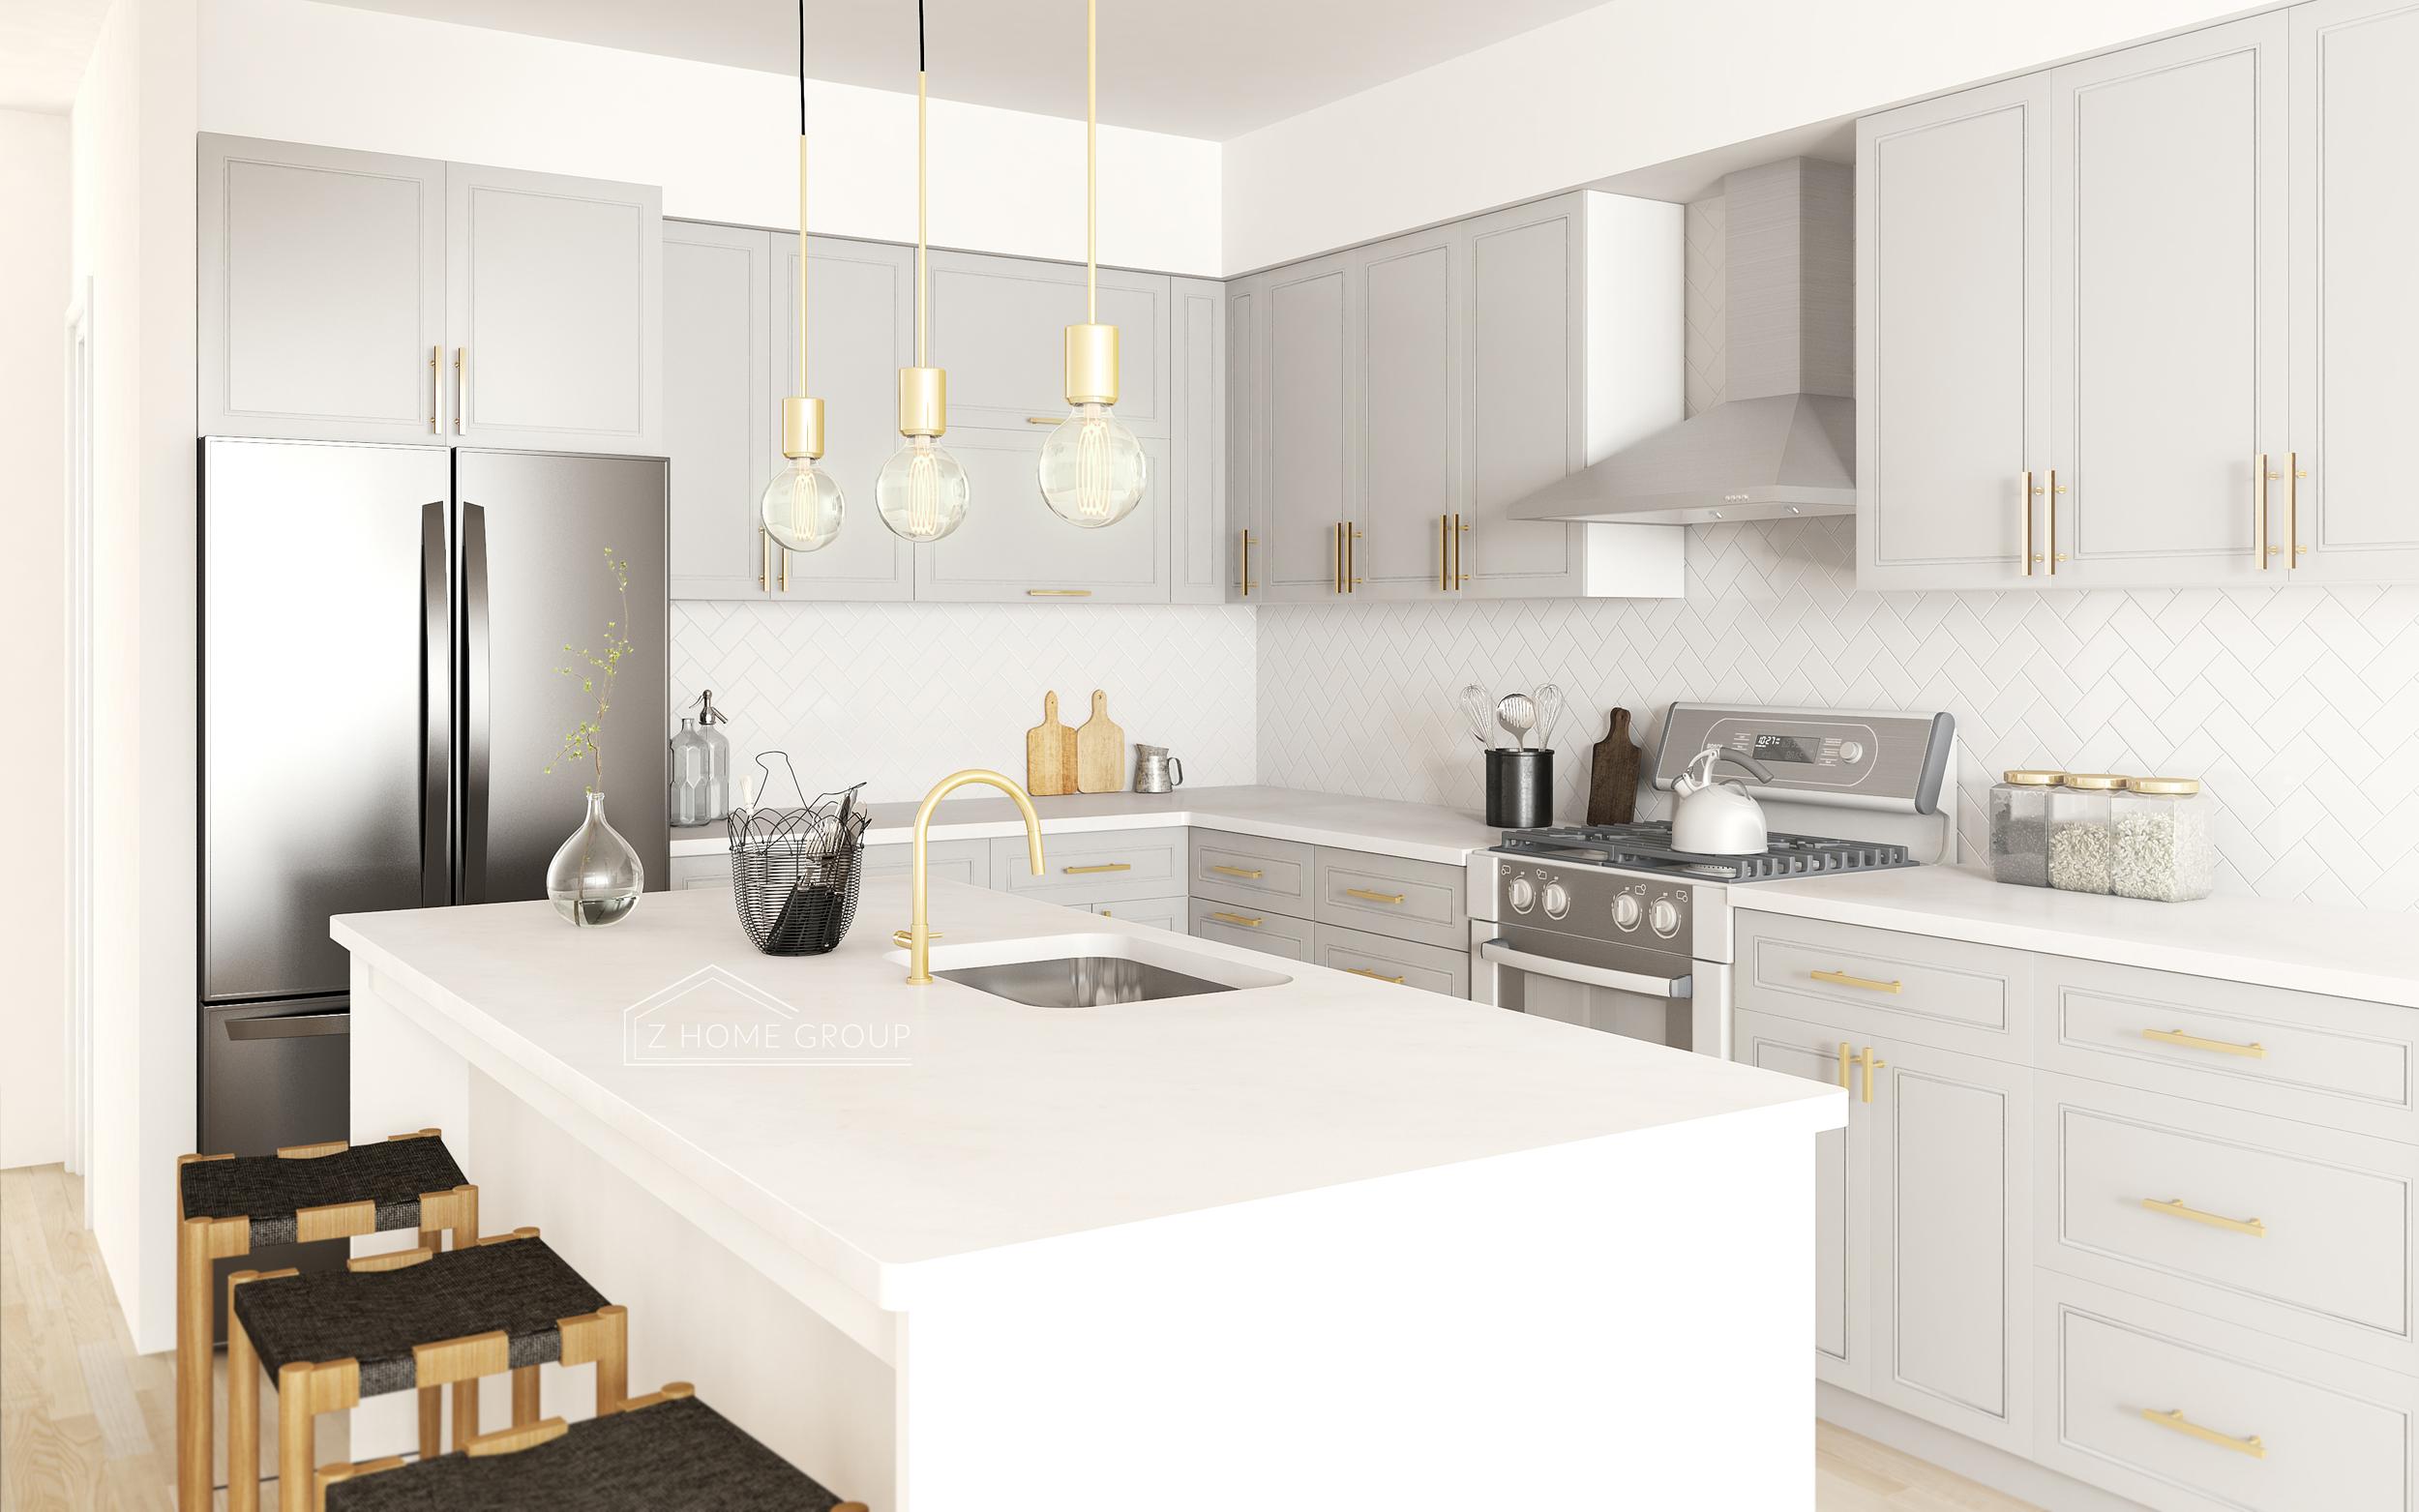 3_Kitchen w lgo.jpg